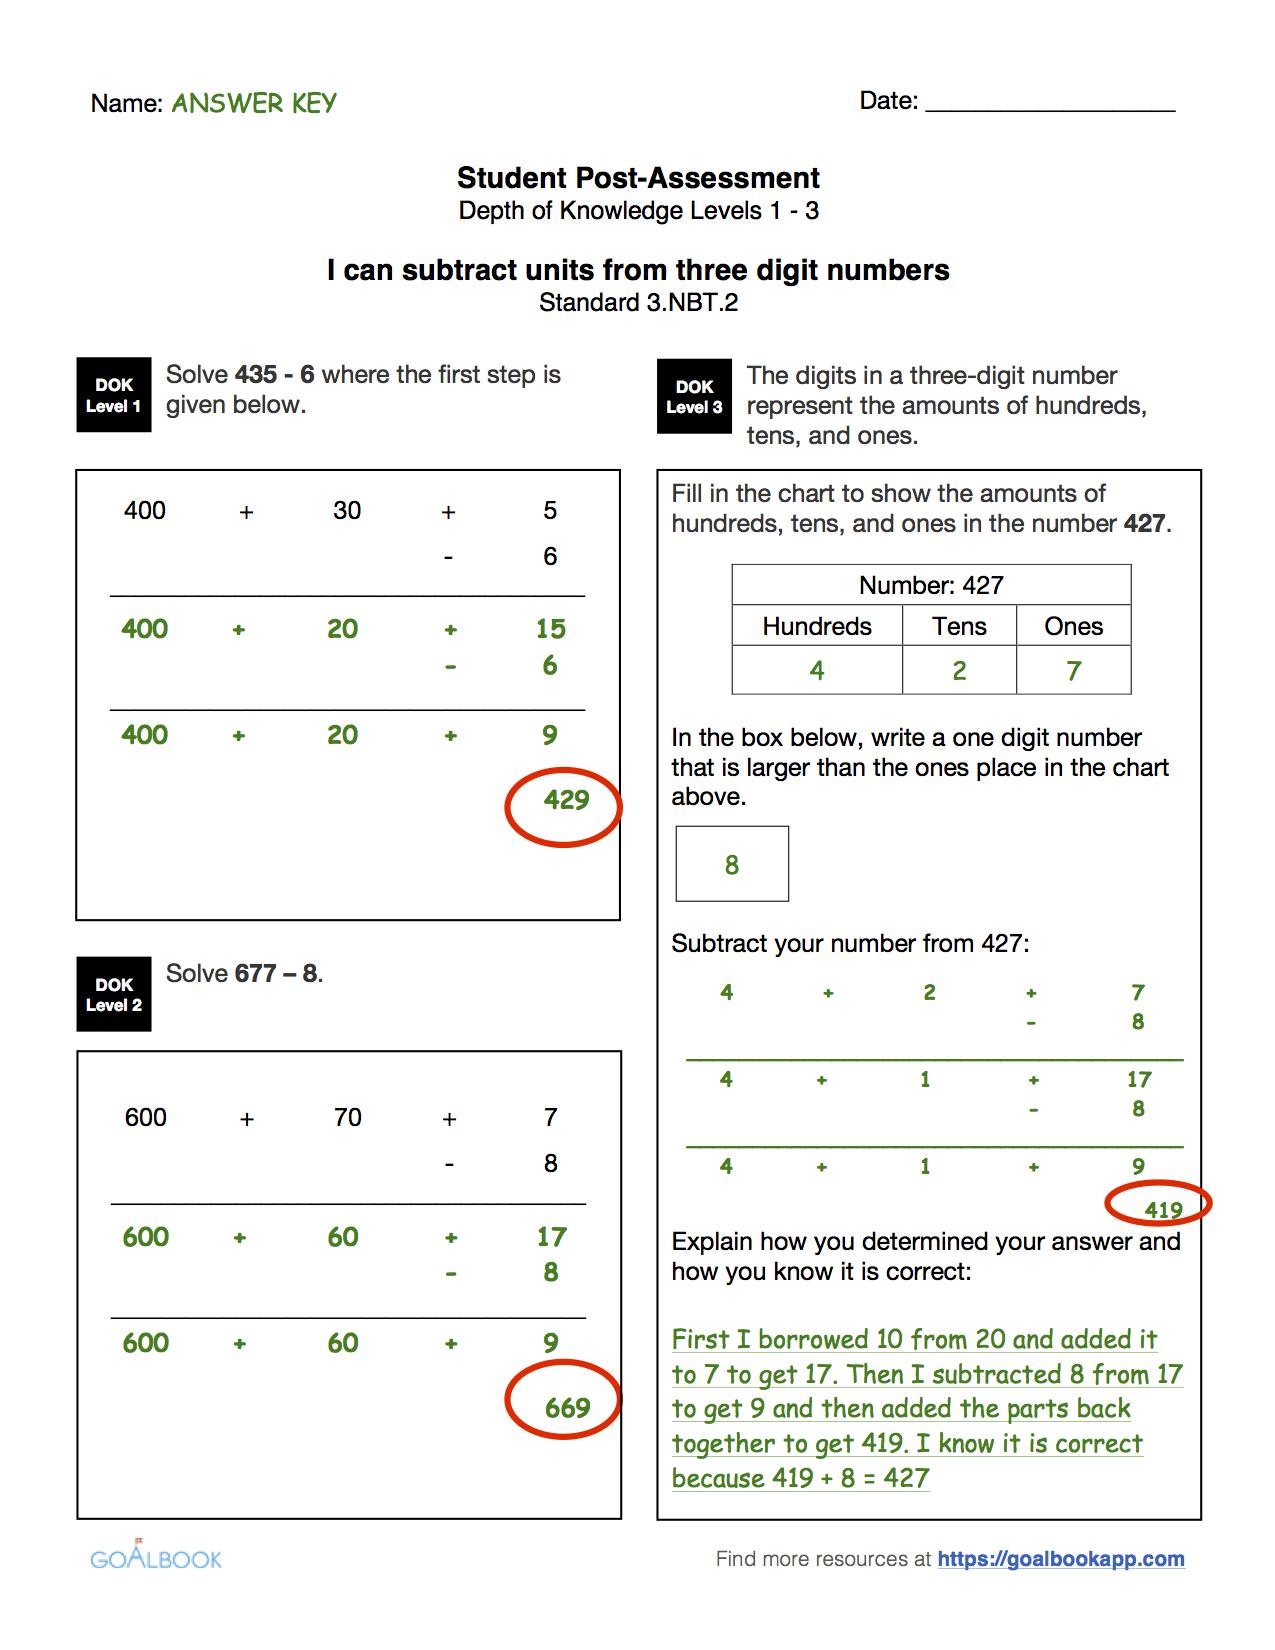 Date subtraction online in Sydney